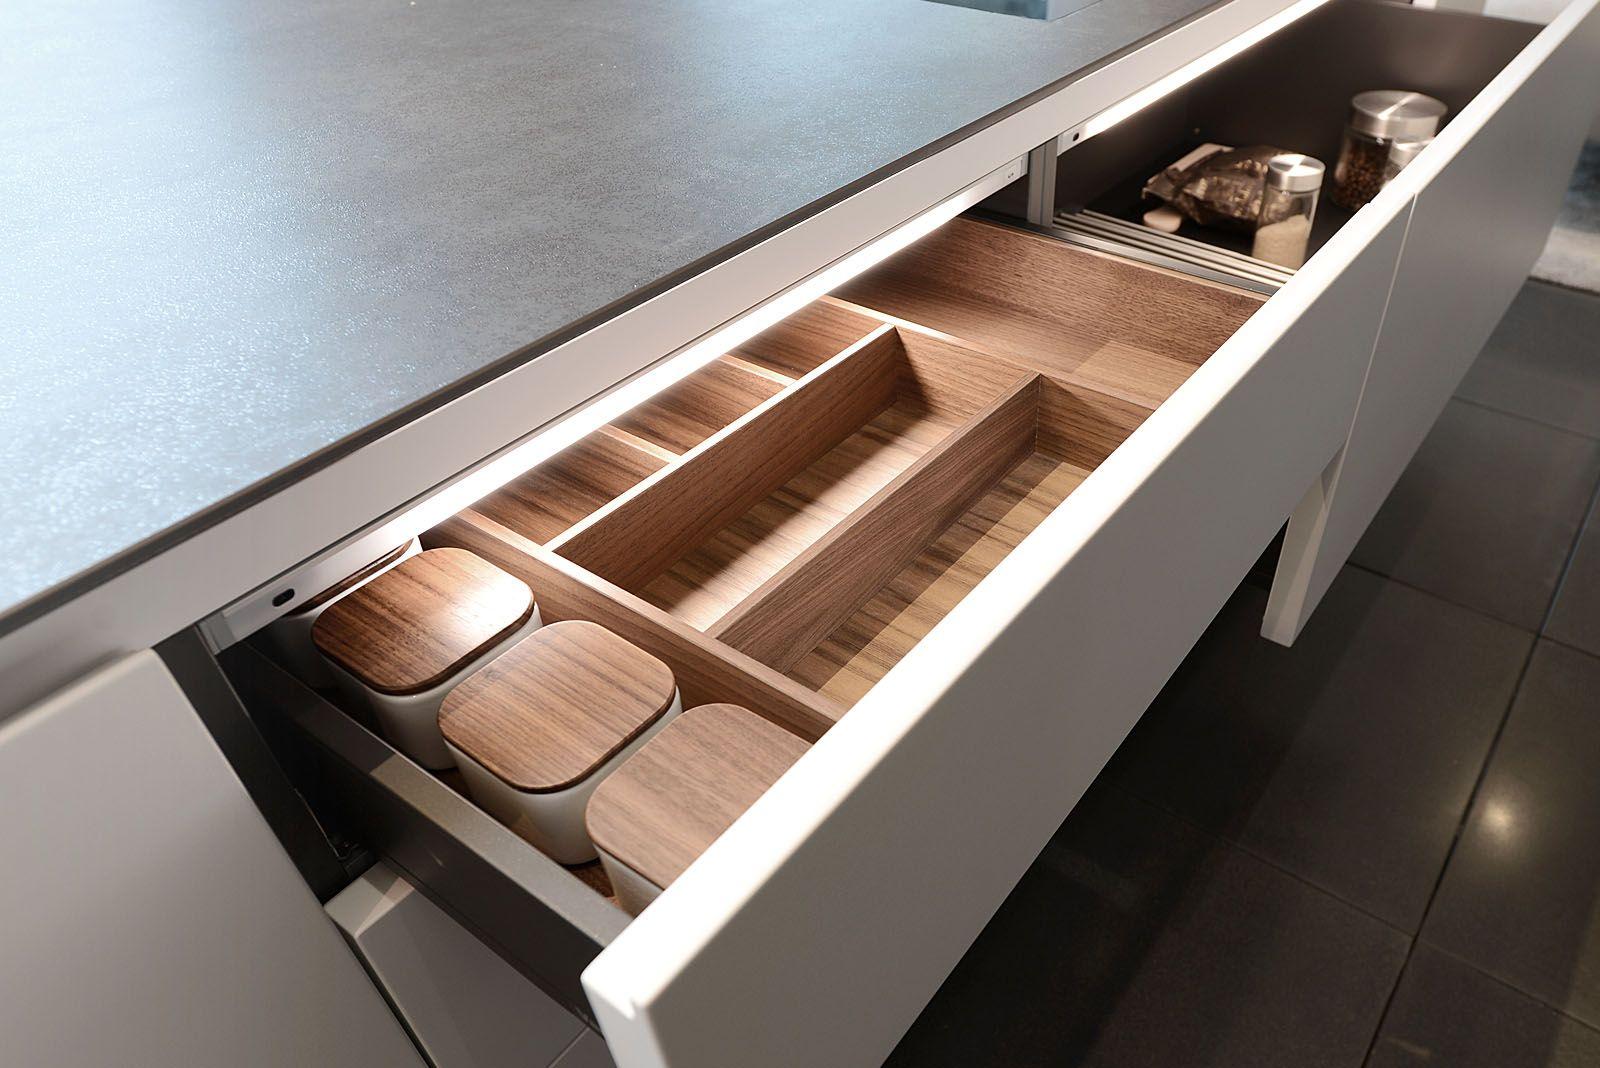 Varenna Mobili ~ Dettaglio portaposate in legno cucina varenna poliform. cucine